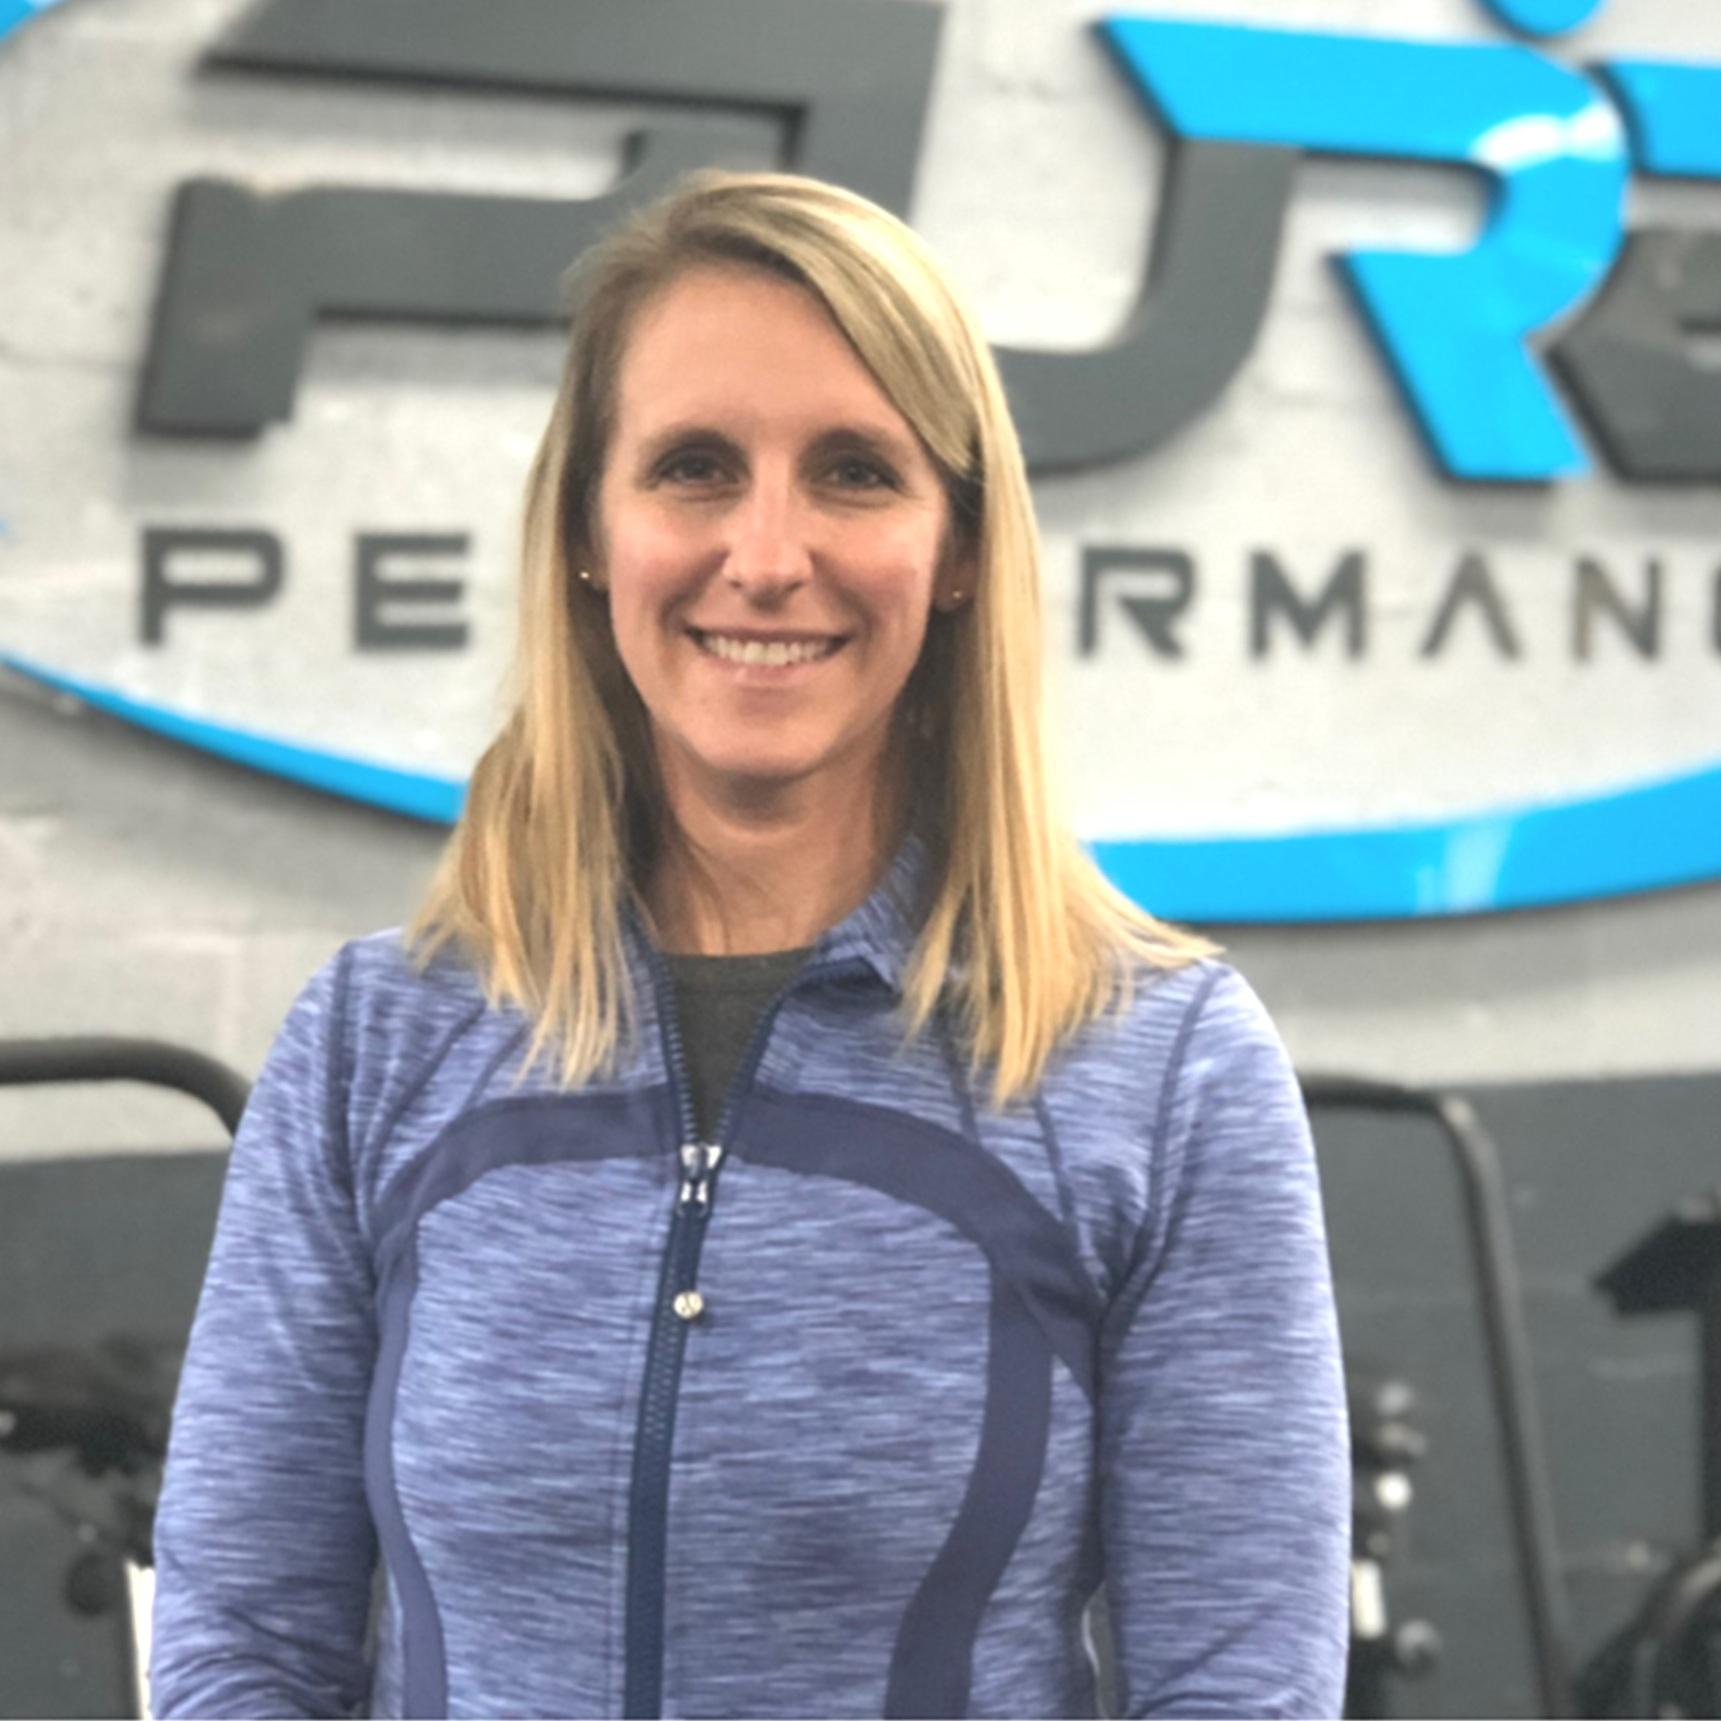 ALLISON STEPHENS, ACE-CPT Women's Fitness Specialist Tenure: 2013-present